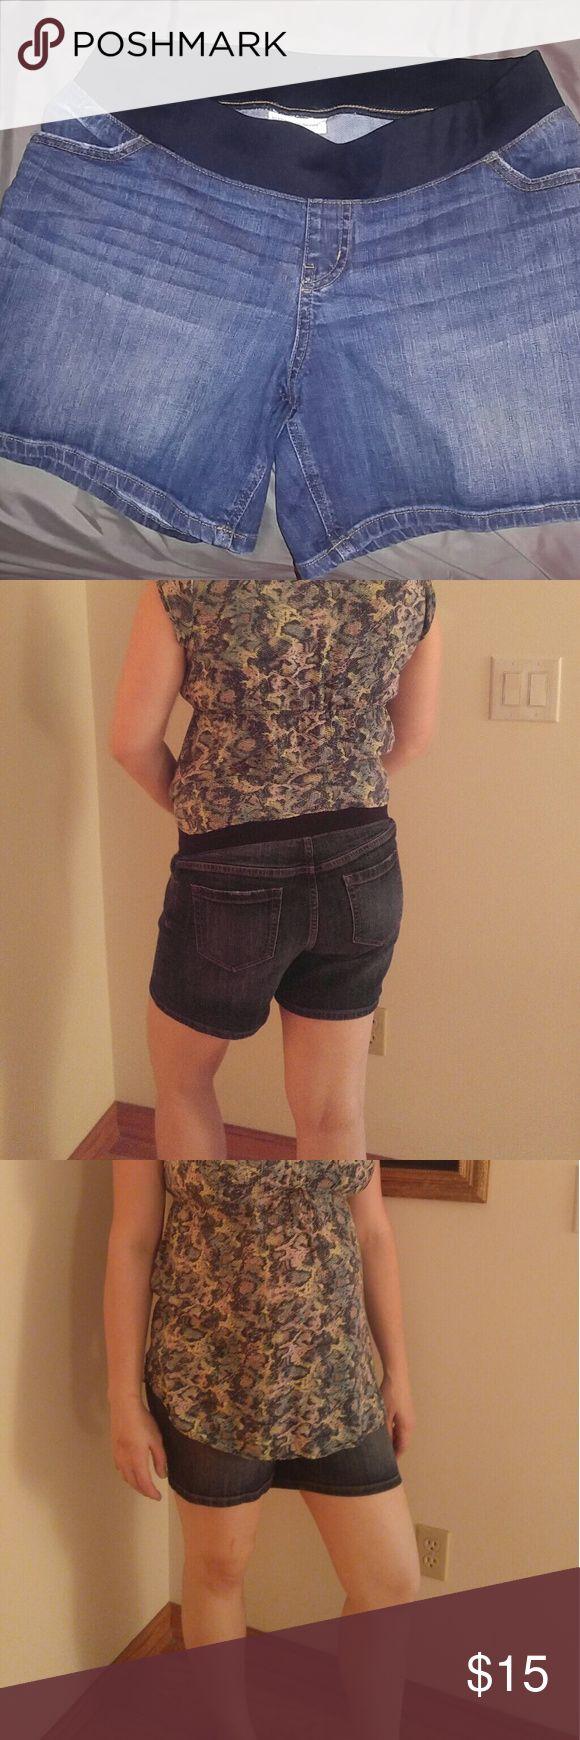 Maternity denim shorts Like New condition, denim shorts. Very slightly distressed. With an elastic banded waist. Liz Lange Shorts Jean Shorts